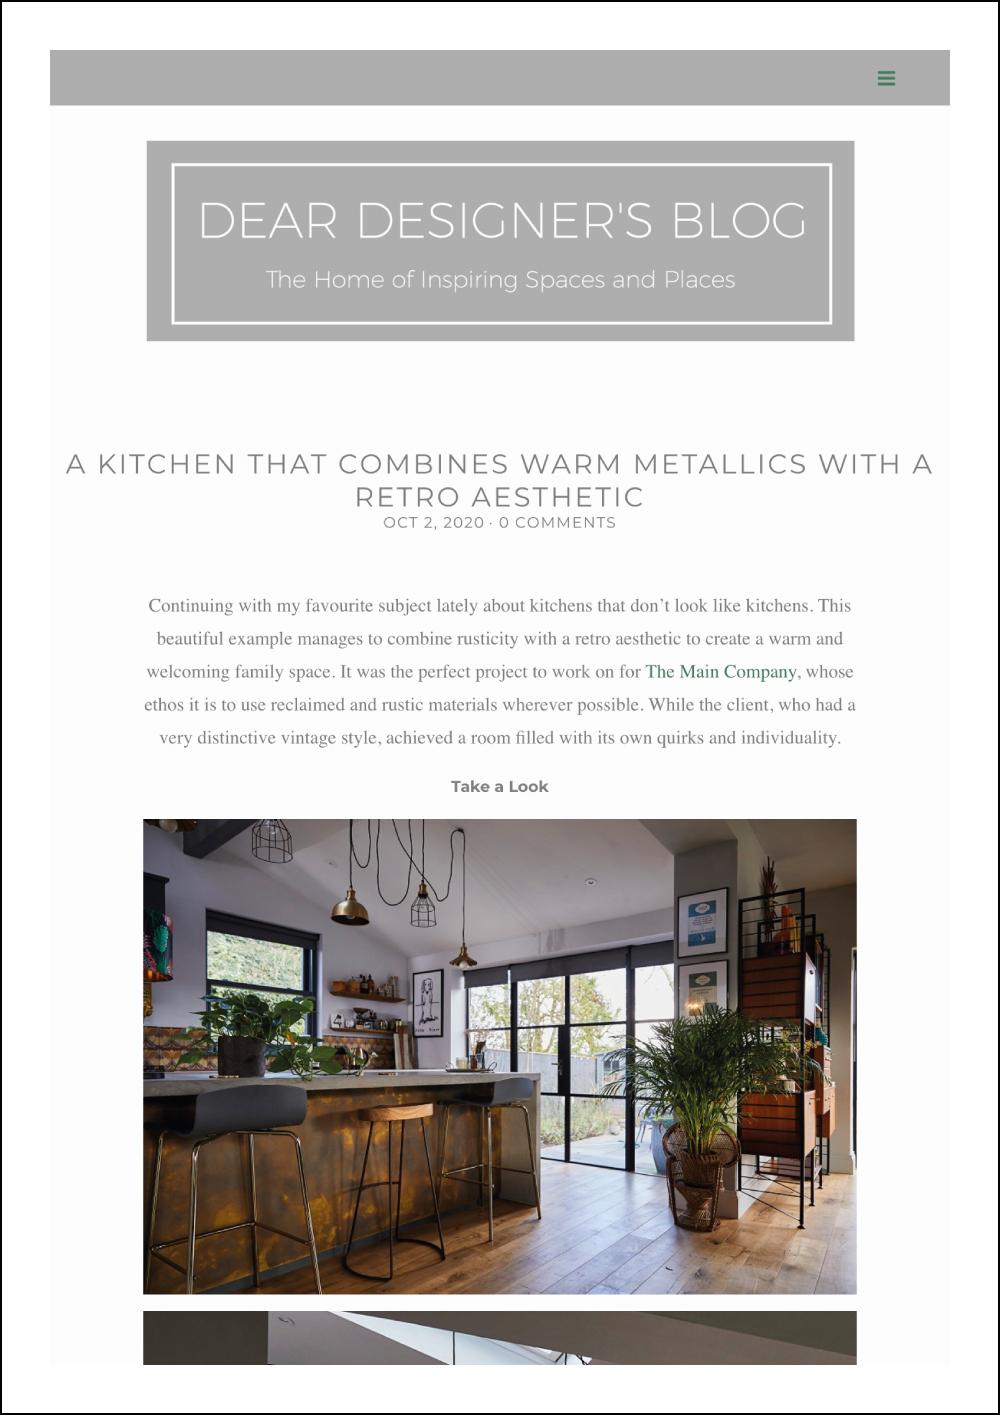 Dear Designer's Blog Post on The Main Company